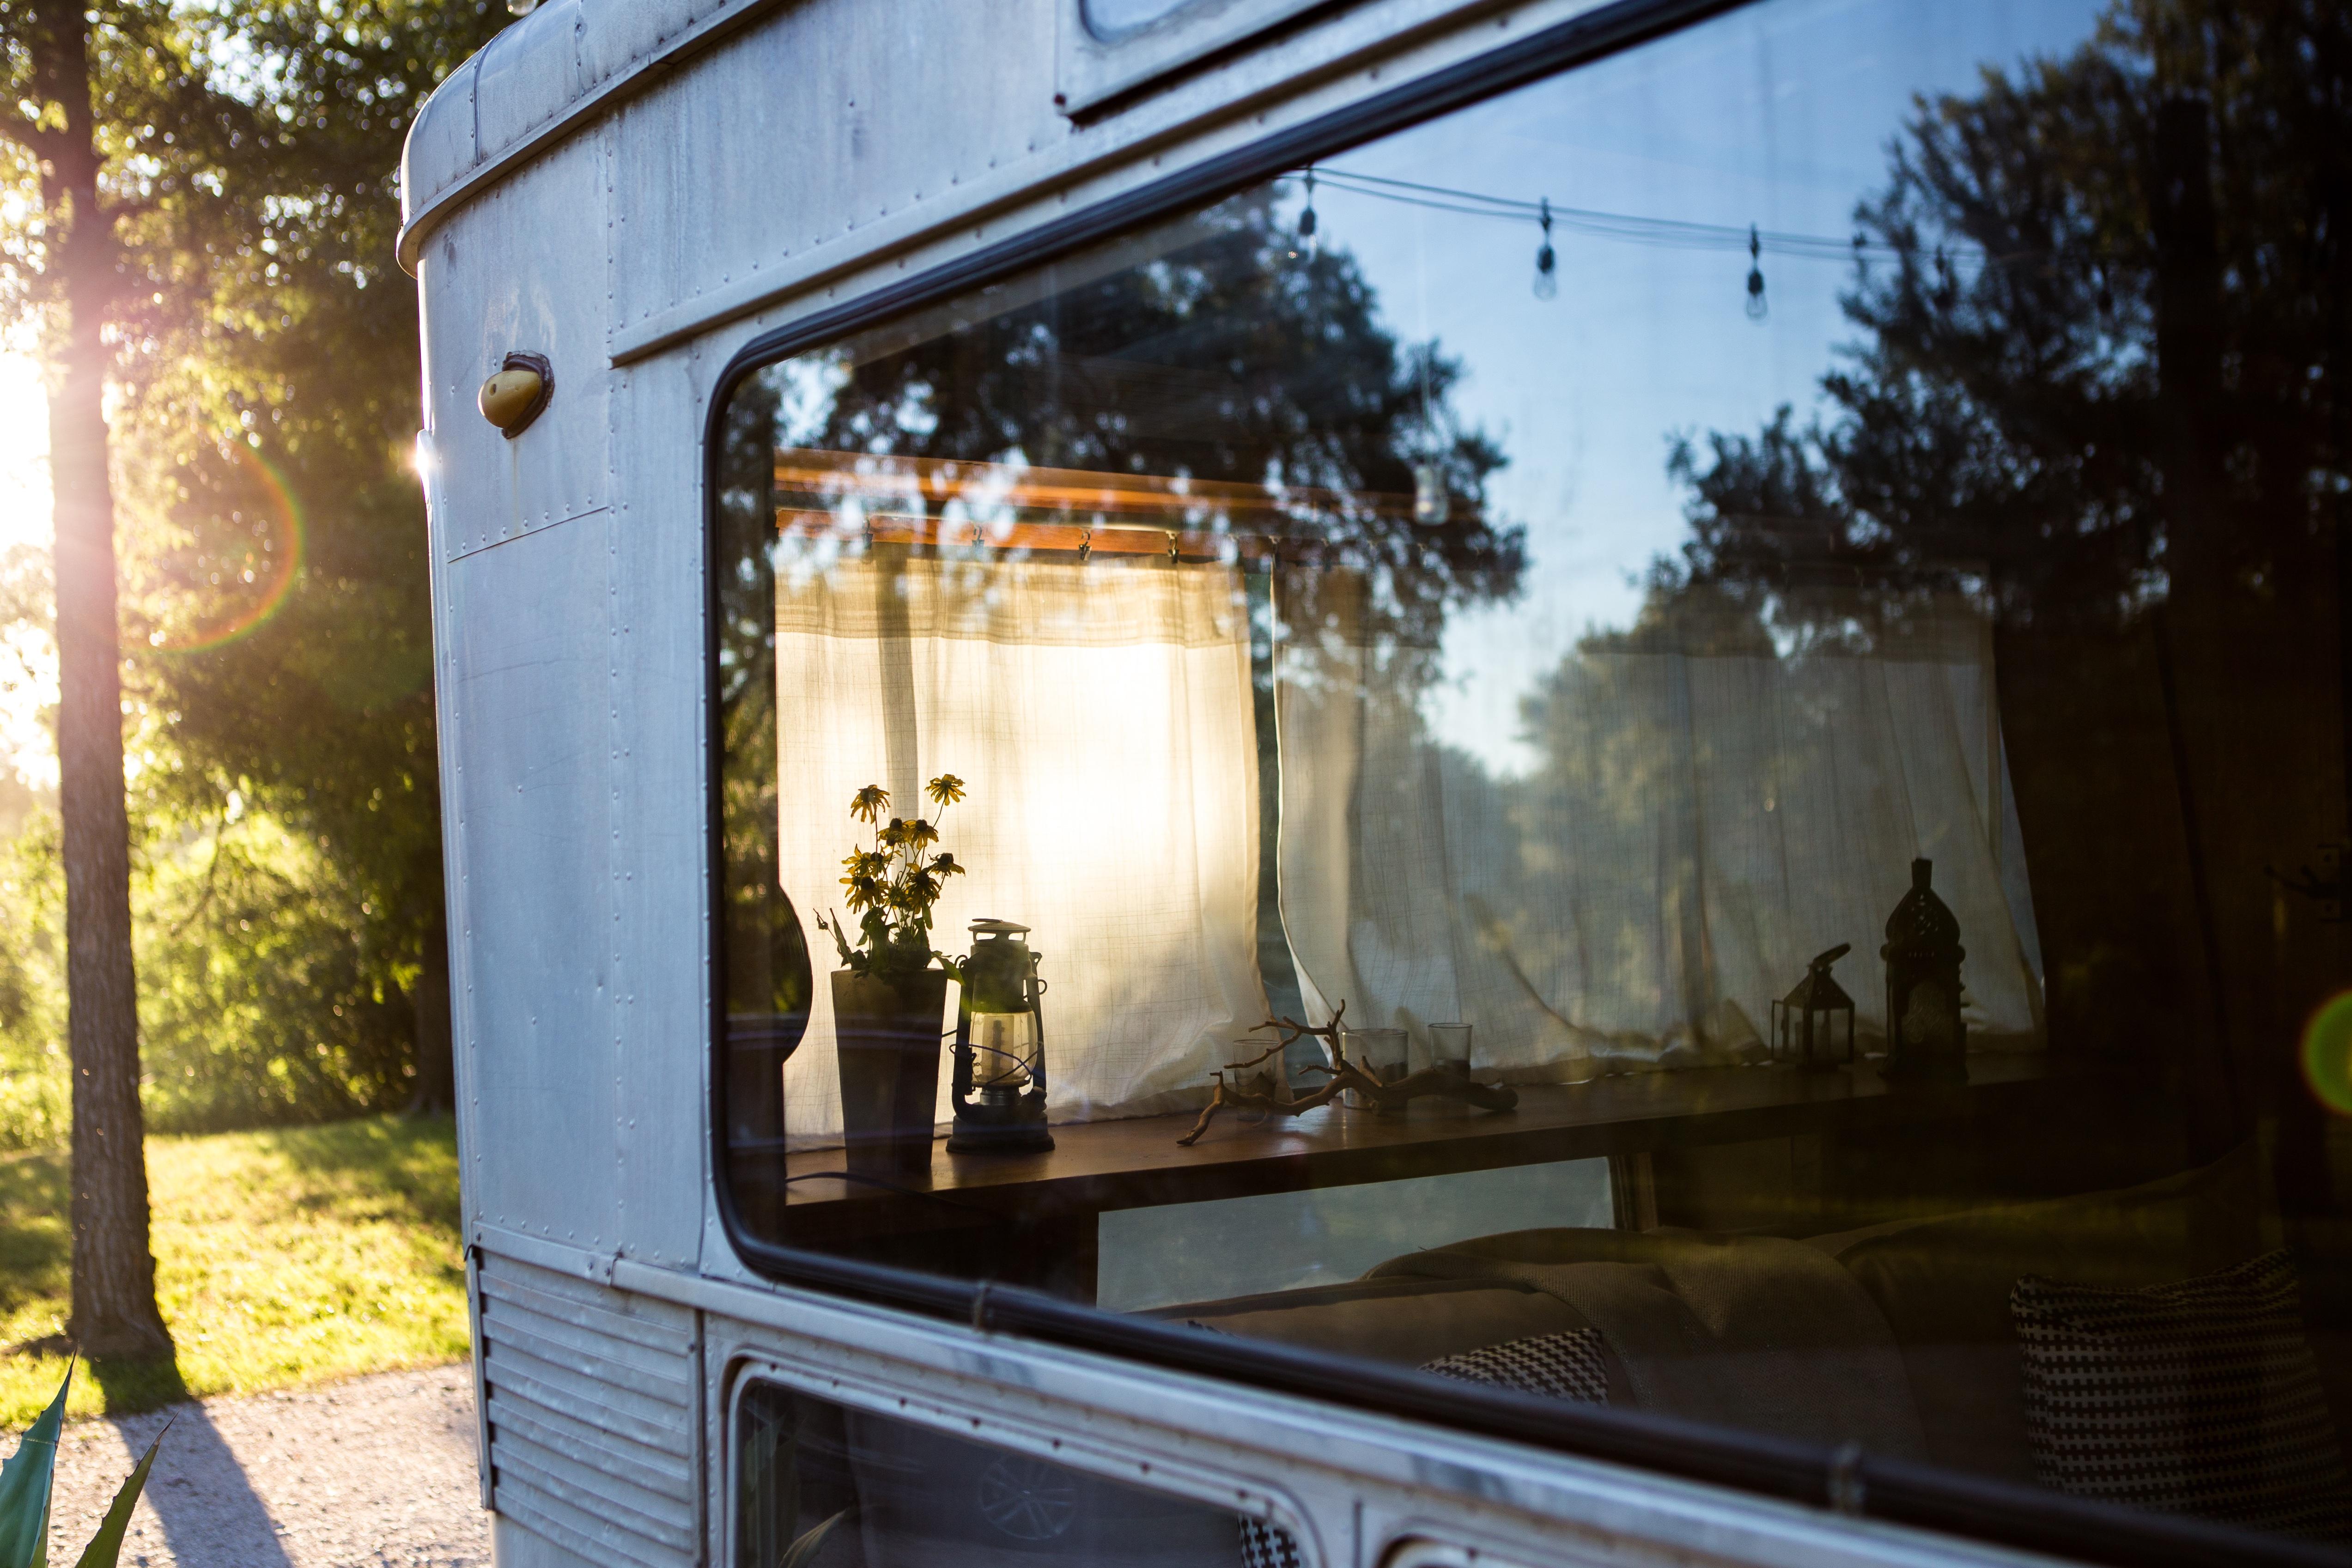 https://get.pxhere.com/photo/light-house-window-home-cottage-lighting-interior-design-1407093.jpg